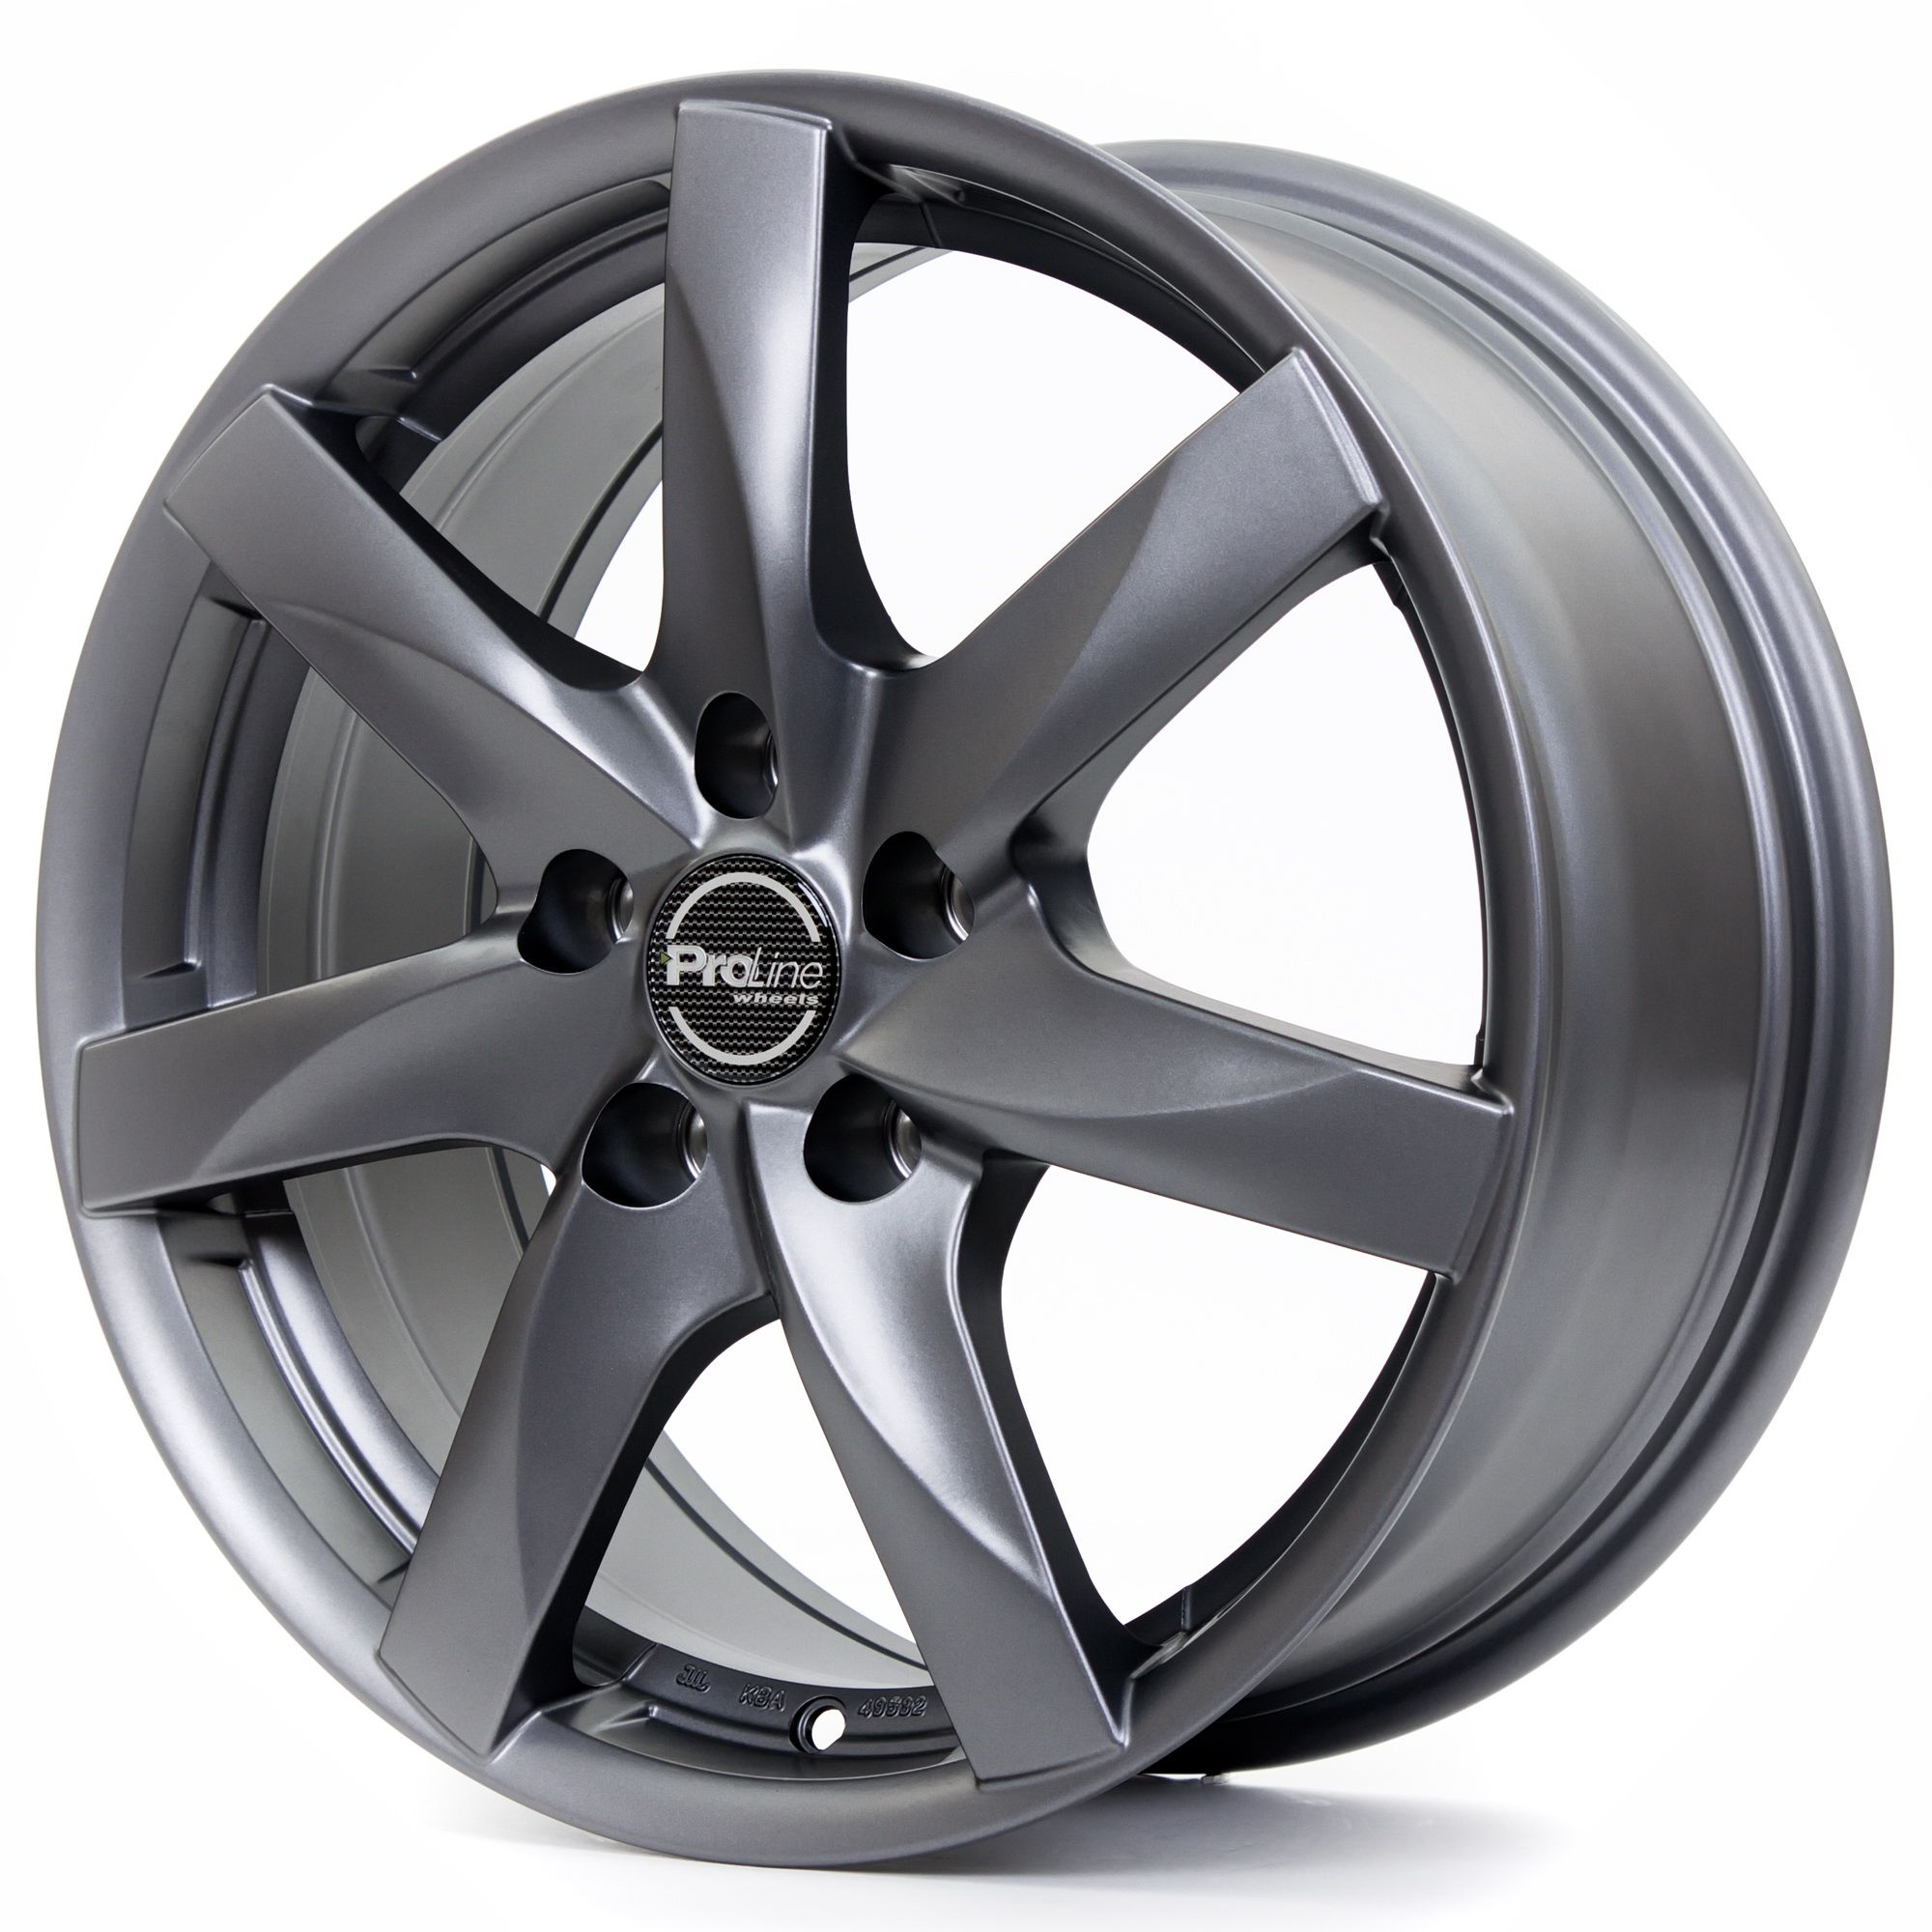 proline wheels bx100 felgen matt grey in 15 zoll. Black Bedroom Furniture Sets. Home Design Ideas